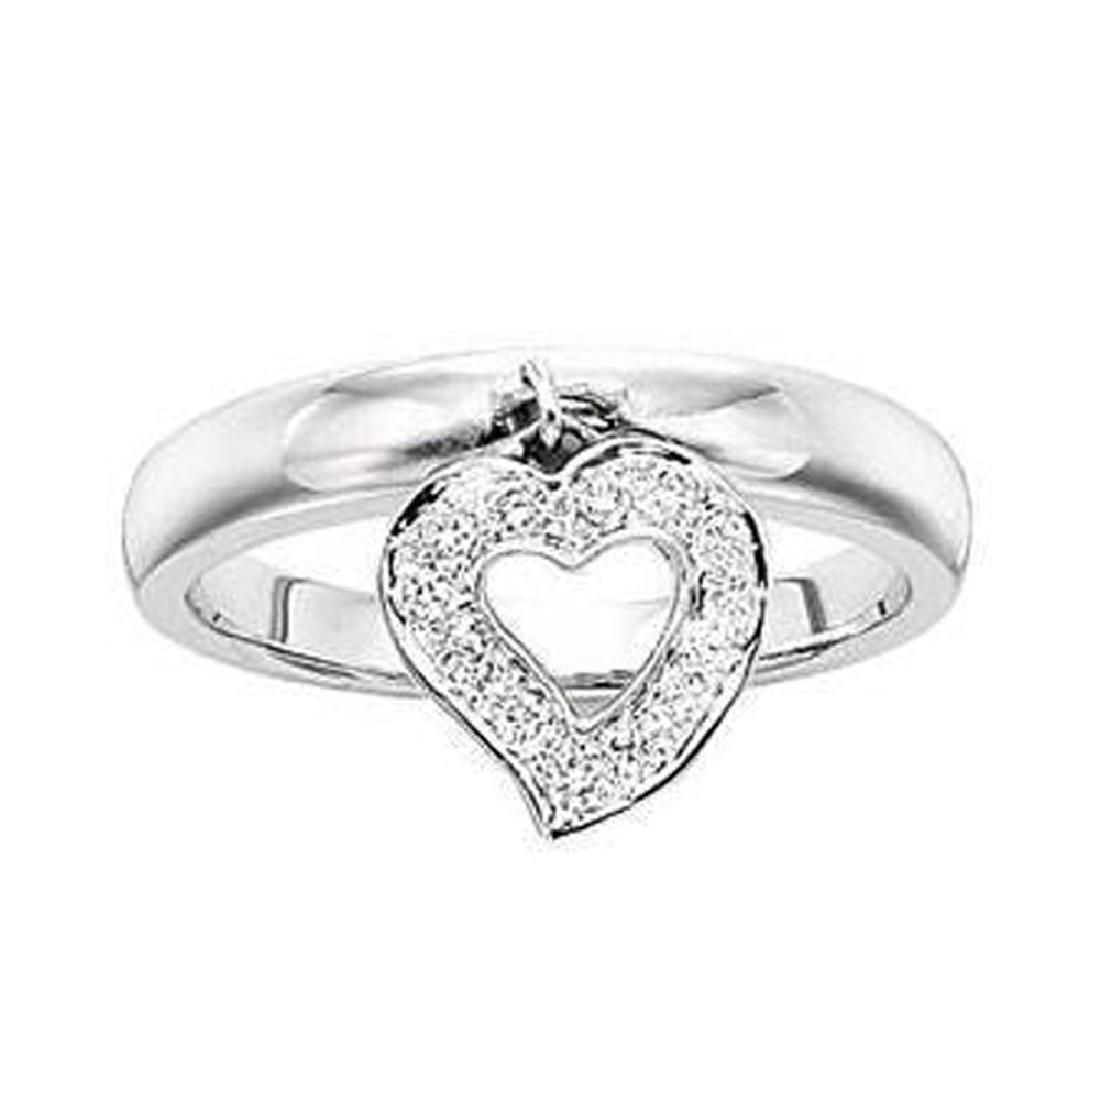 *Fine Jewelry, 14KT White Gold, 0.30CT Diamond Ring (GL